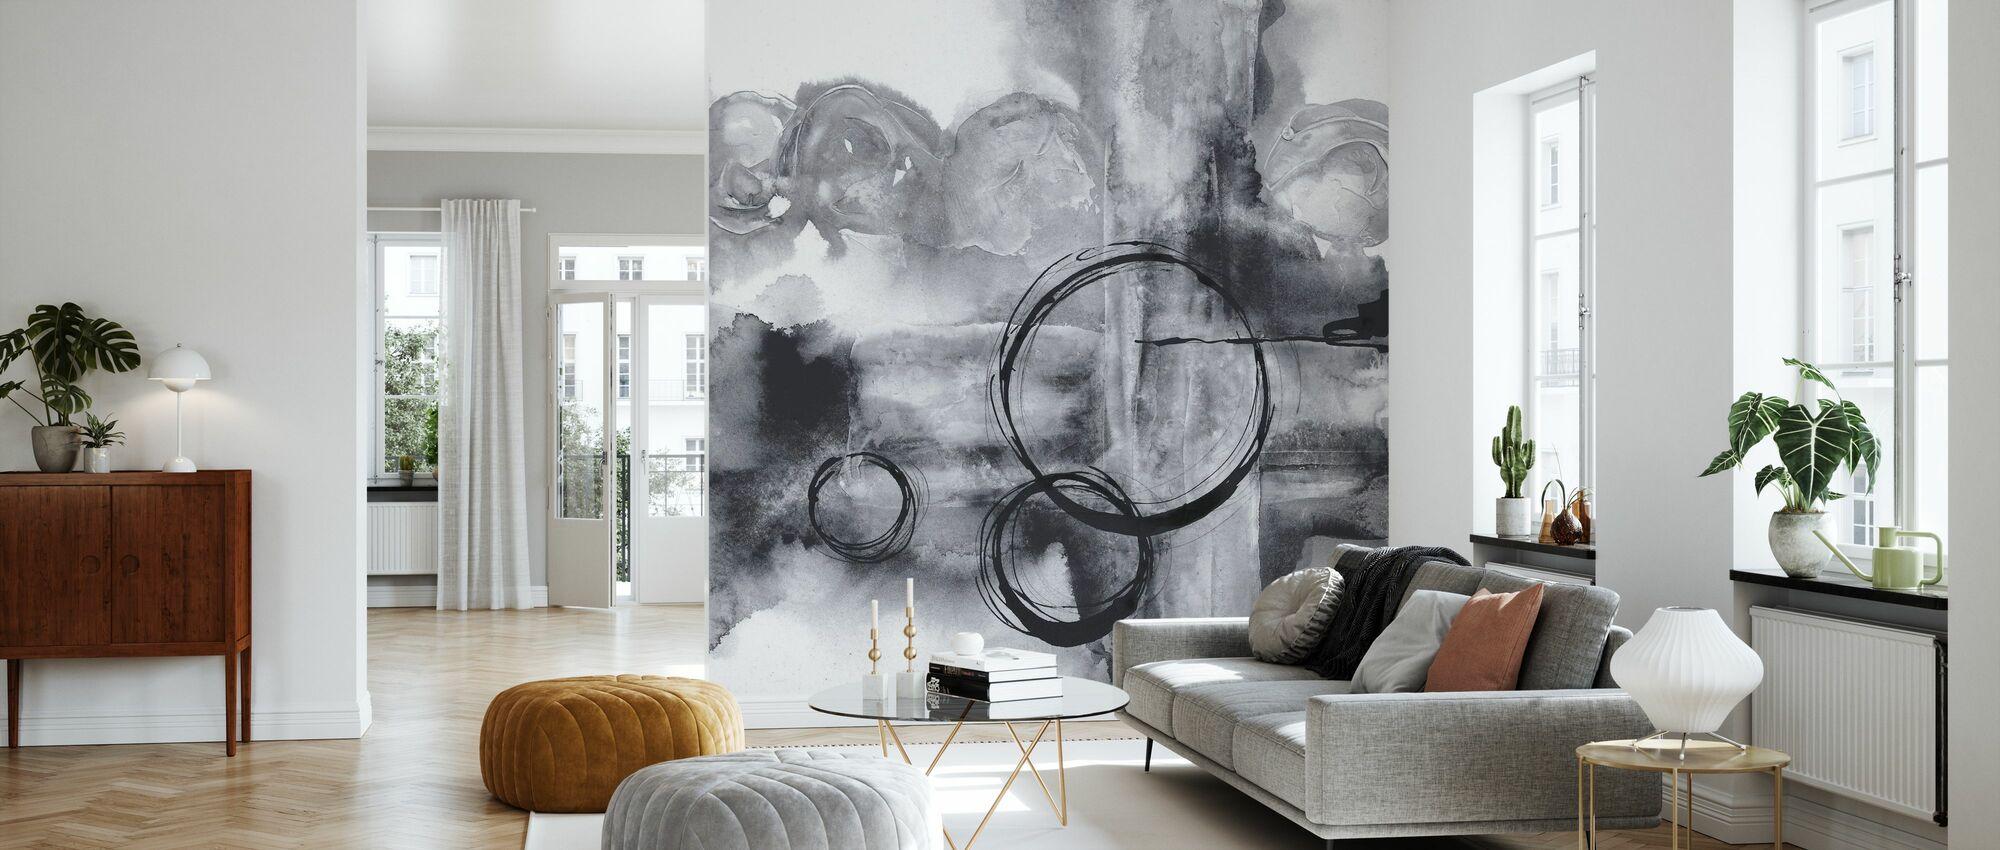 Full Circle II - Wallpaper - Living Room